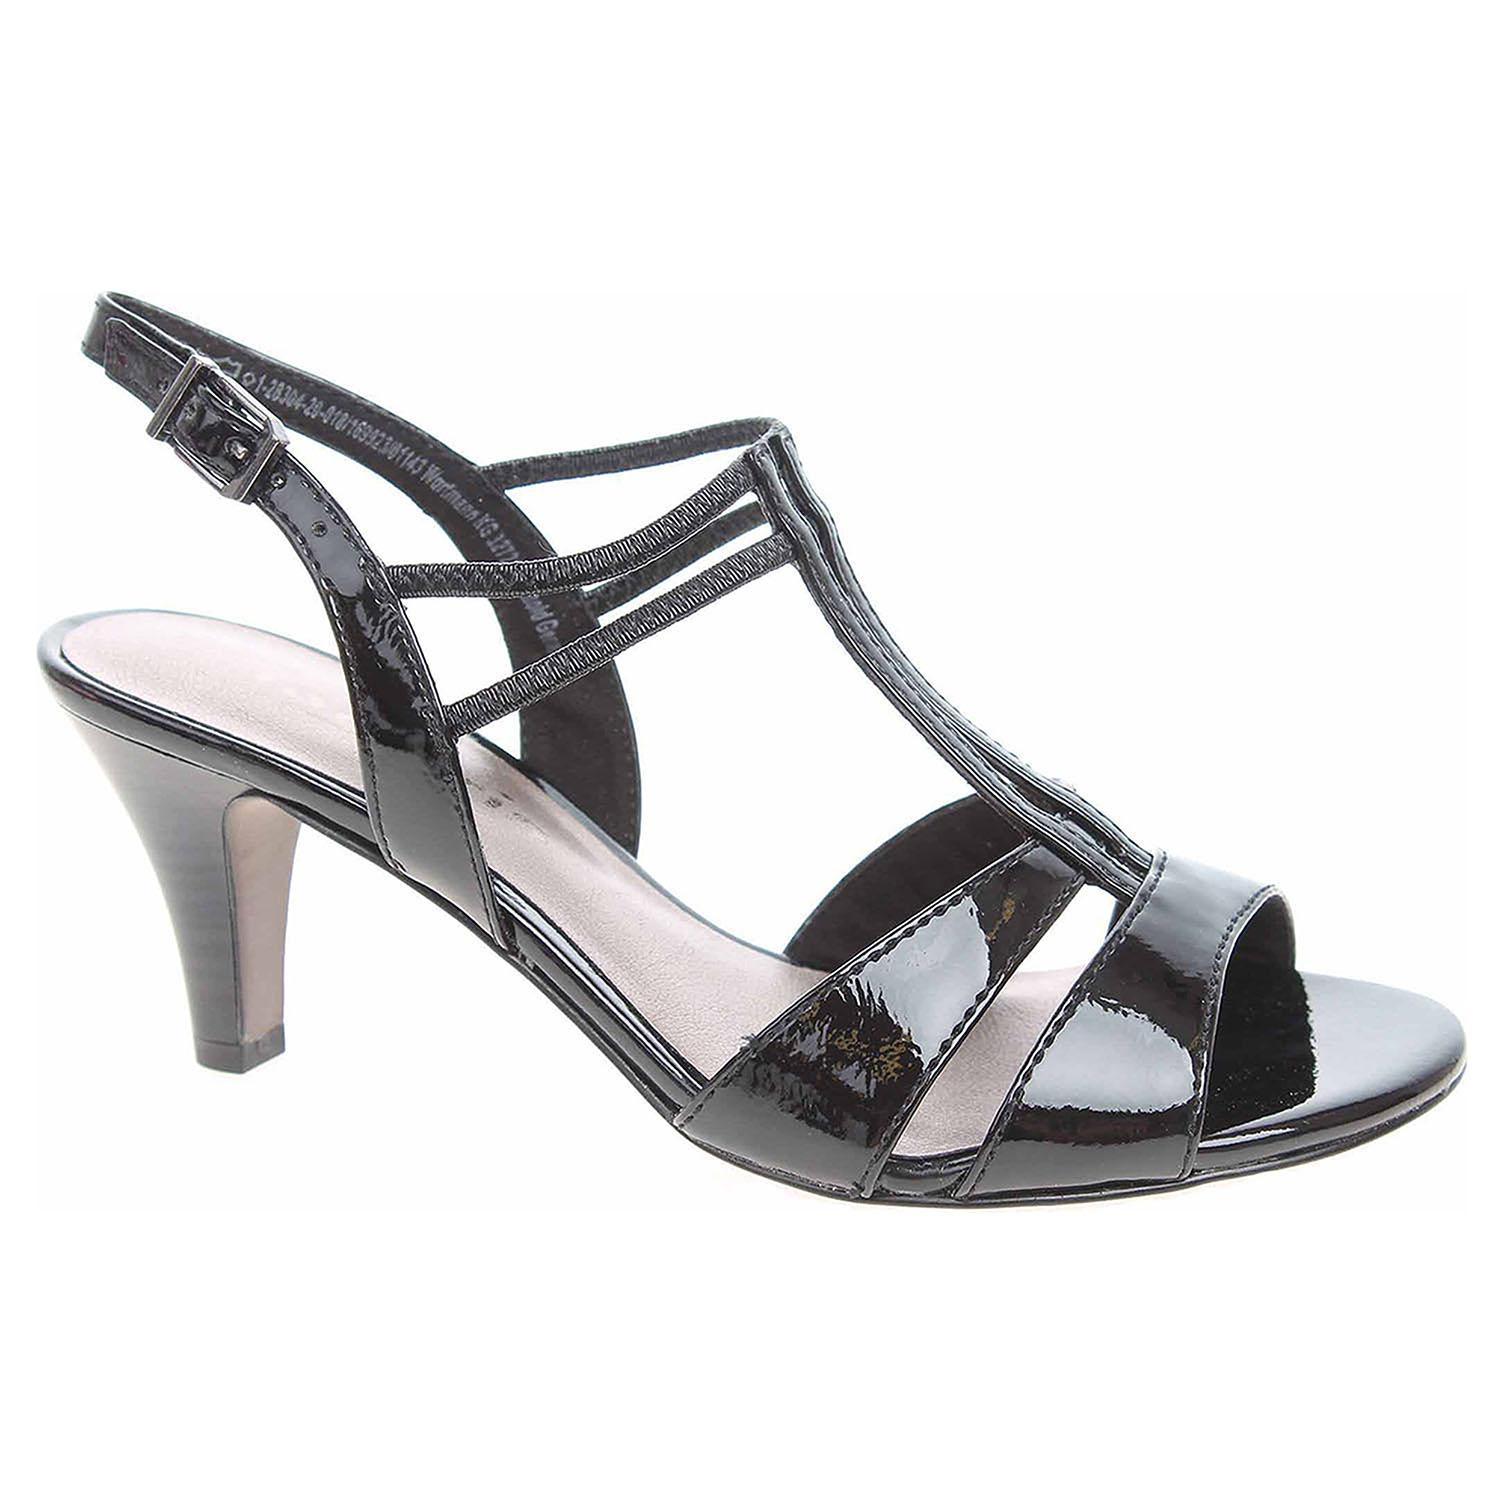 3326246960 detail Dámska spoločenské topánky Tamaris 1-28304-22 black patent